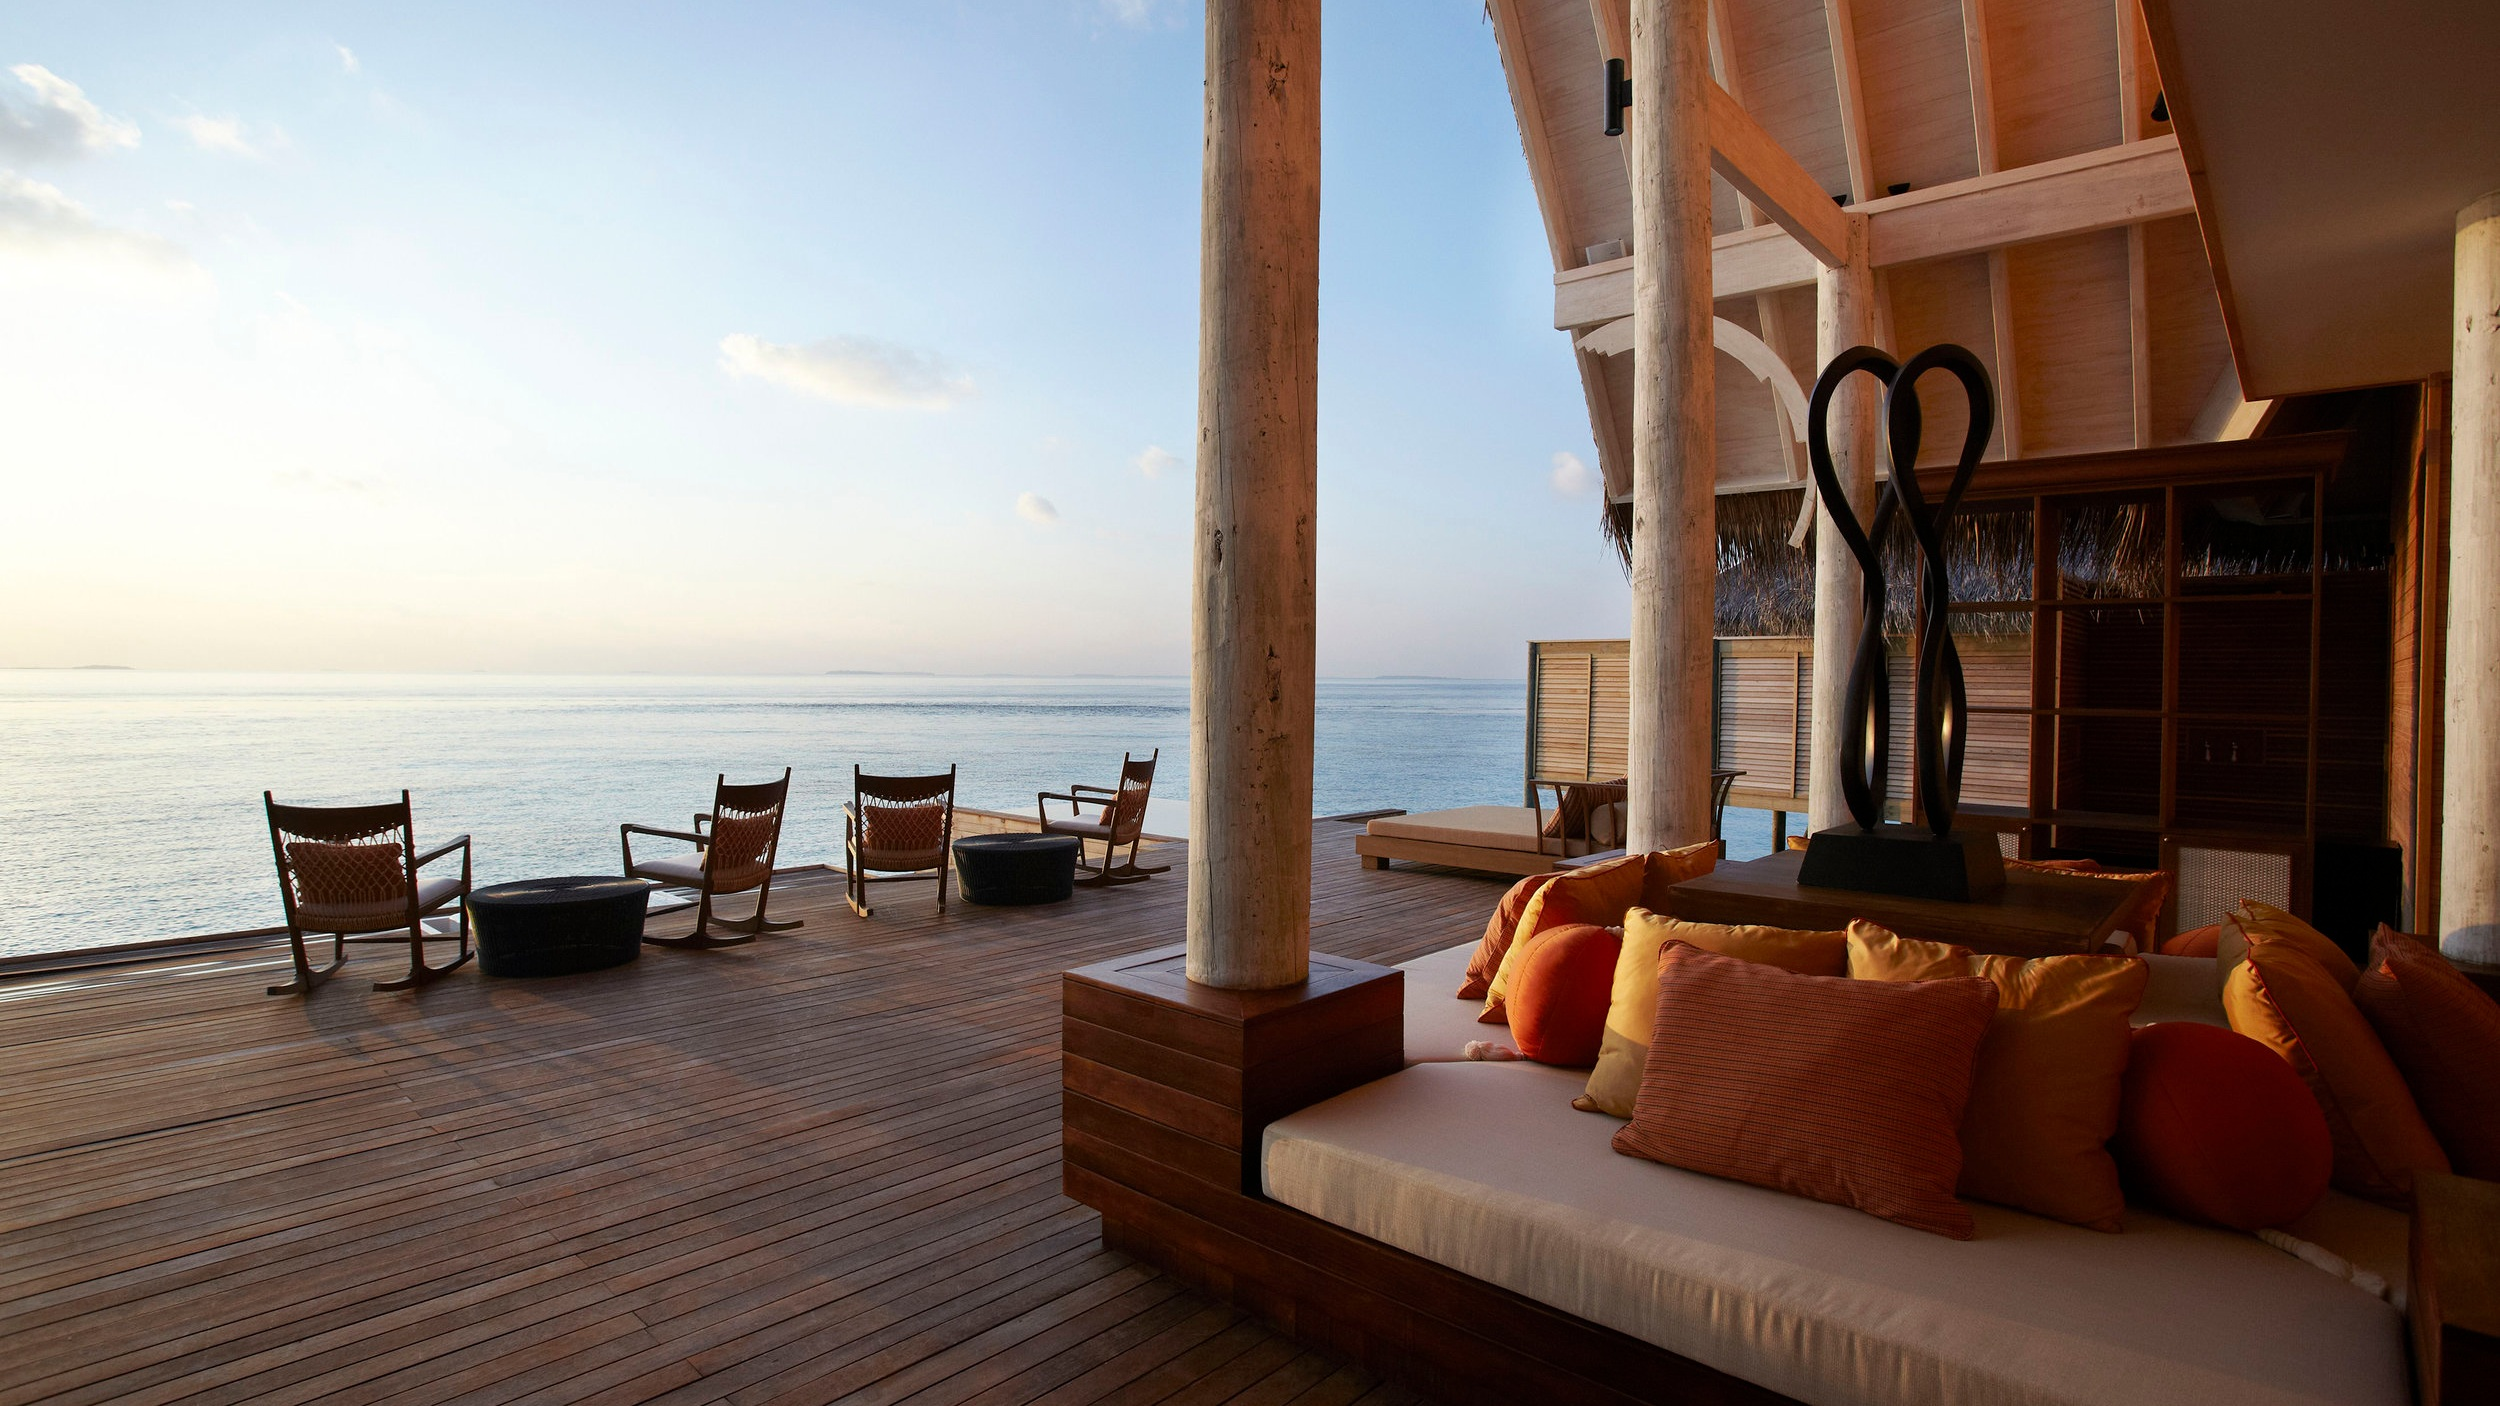 61616889-H1-Anantara_Kihavah_Villas_Spa_relaxation_deck_ocean_view.jpg